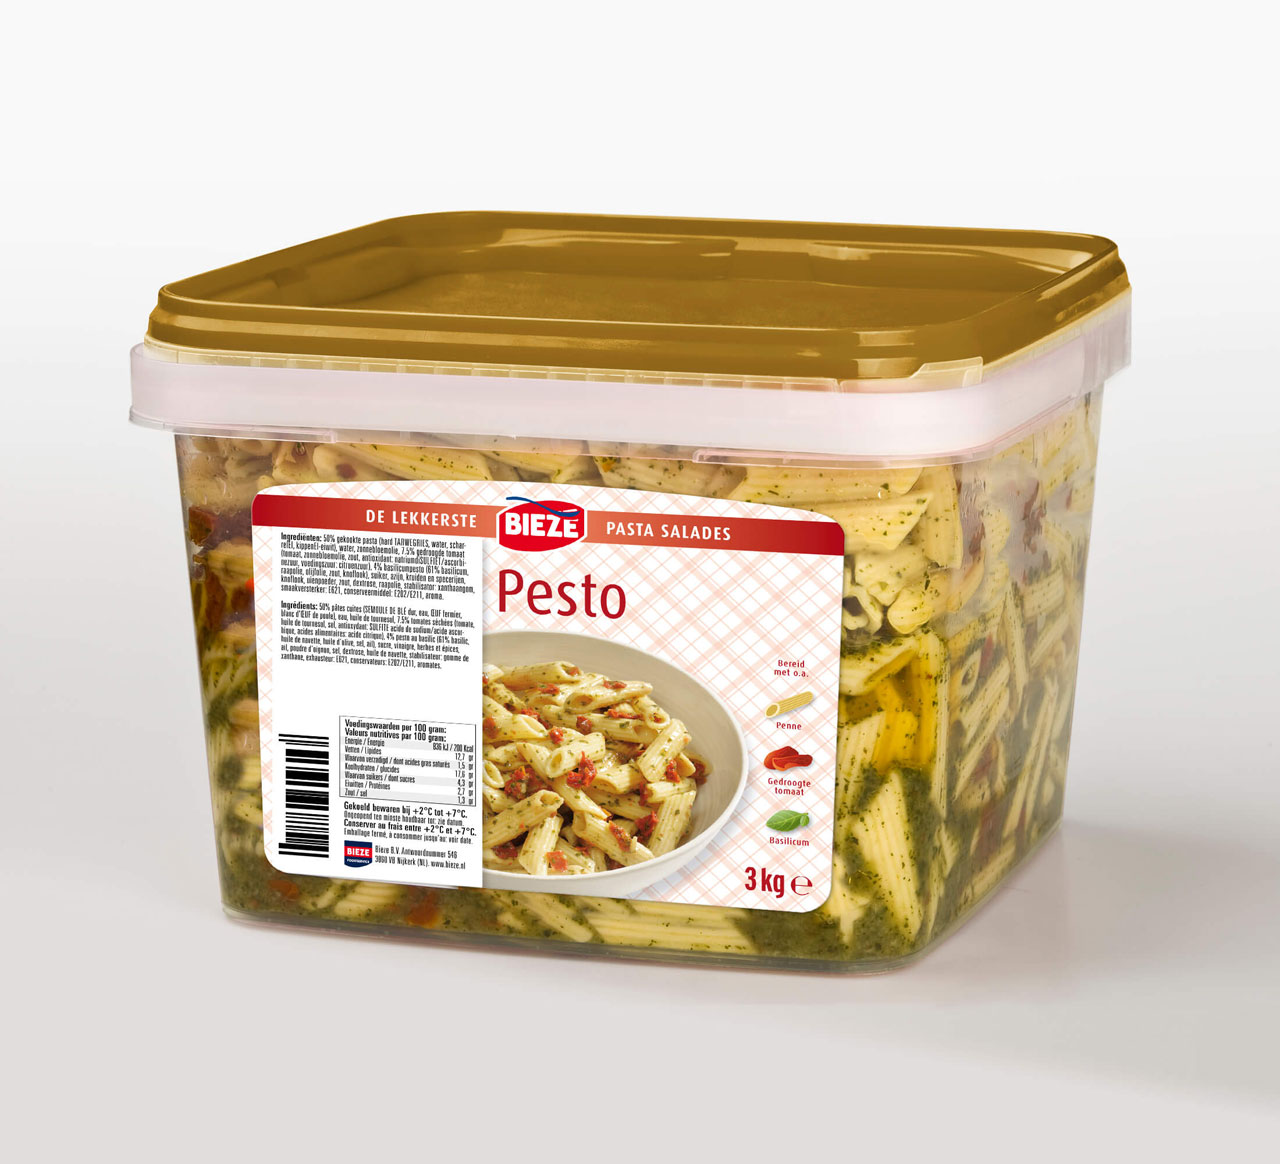 Bieze pasta salade pesto